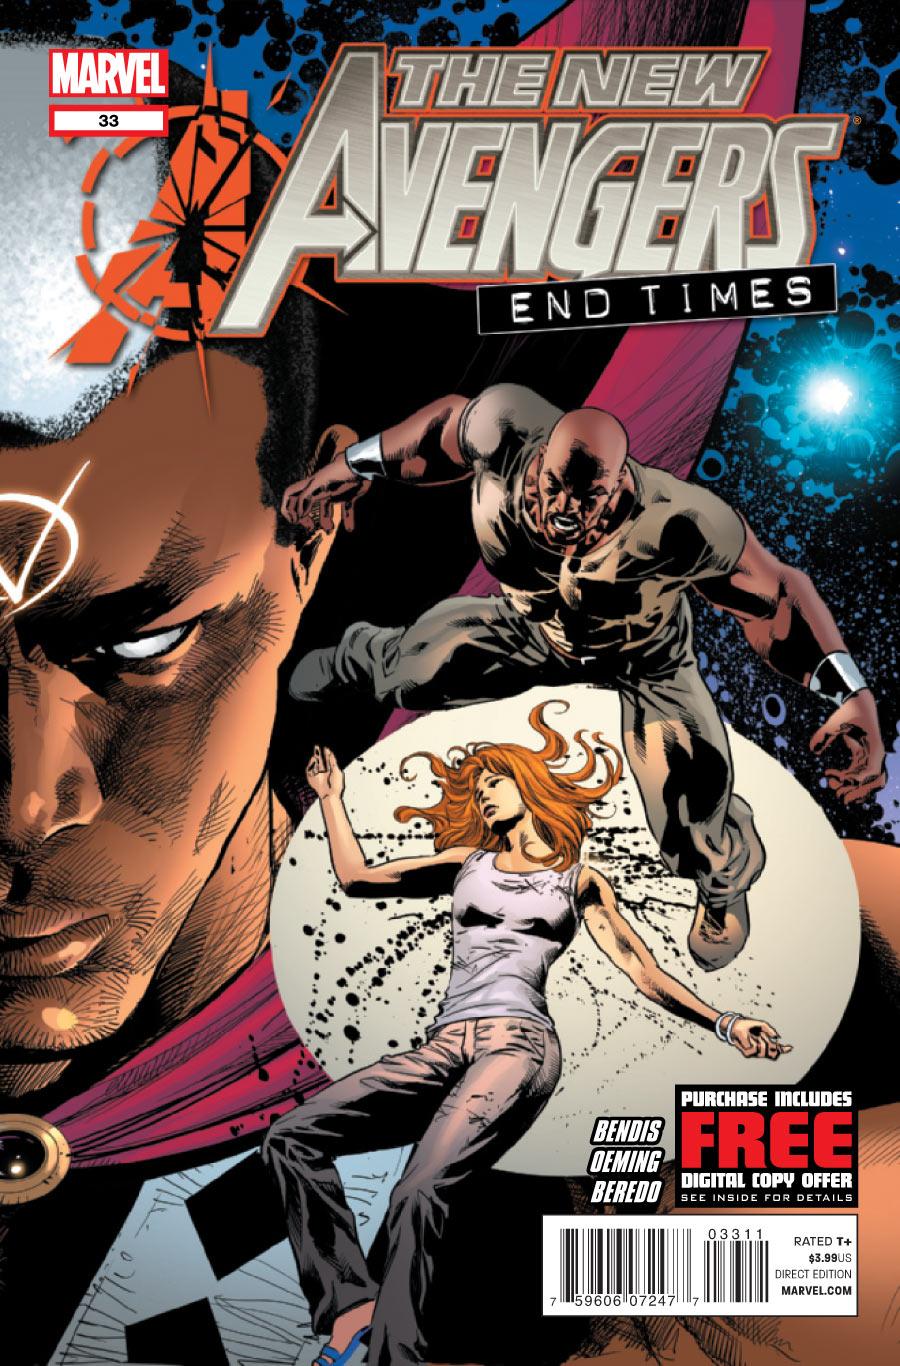 The New Avengers #33